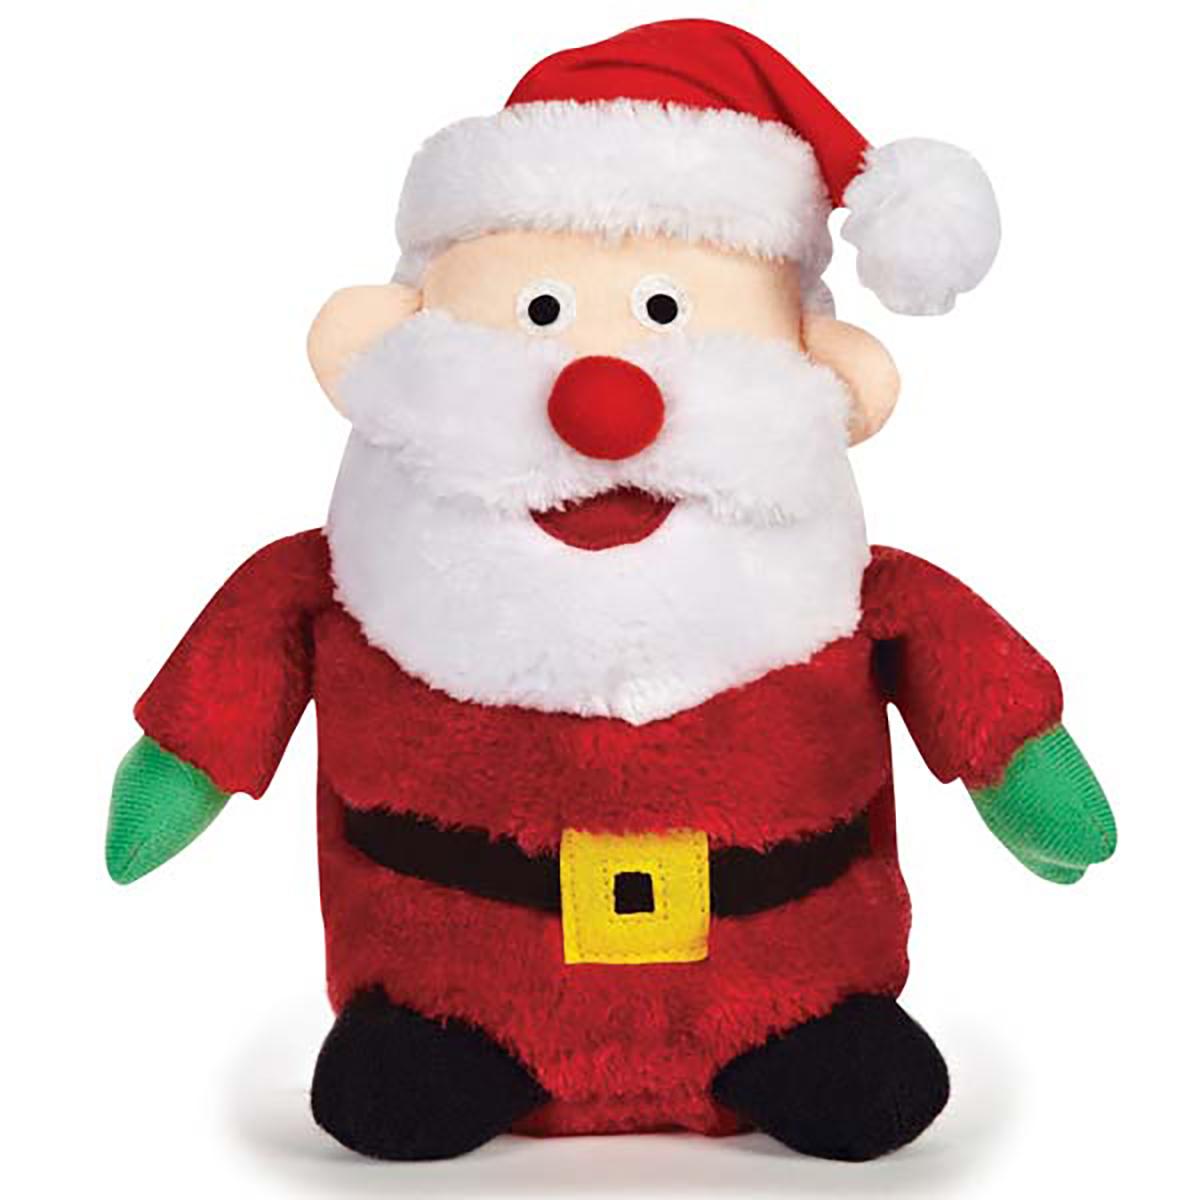 Zanies Holiday Friends Dog Toy - Santa